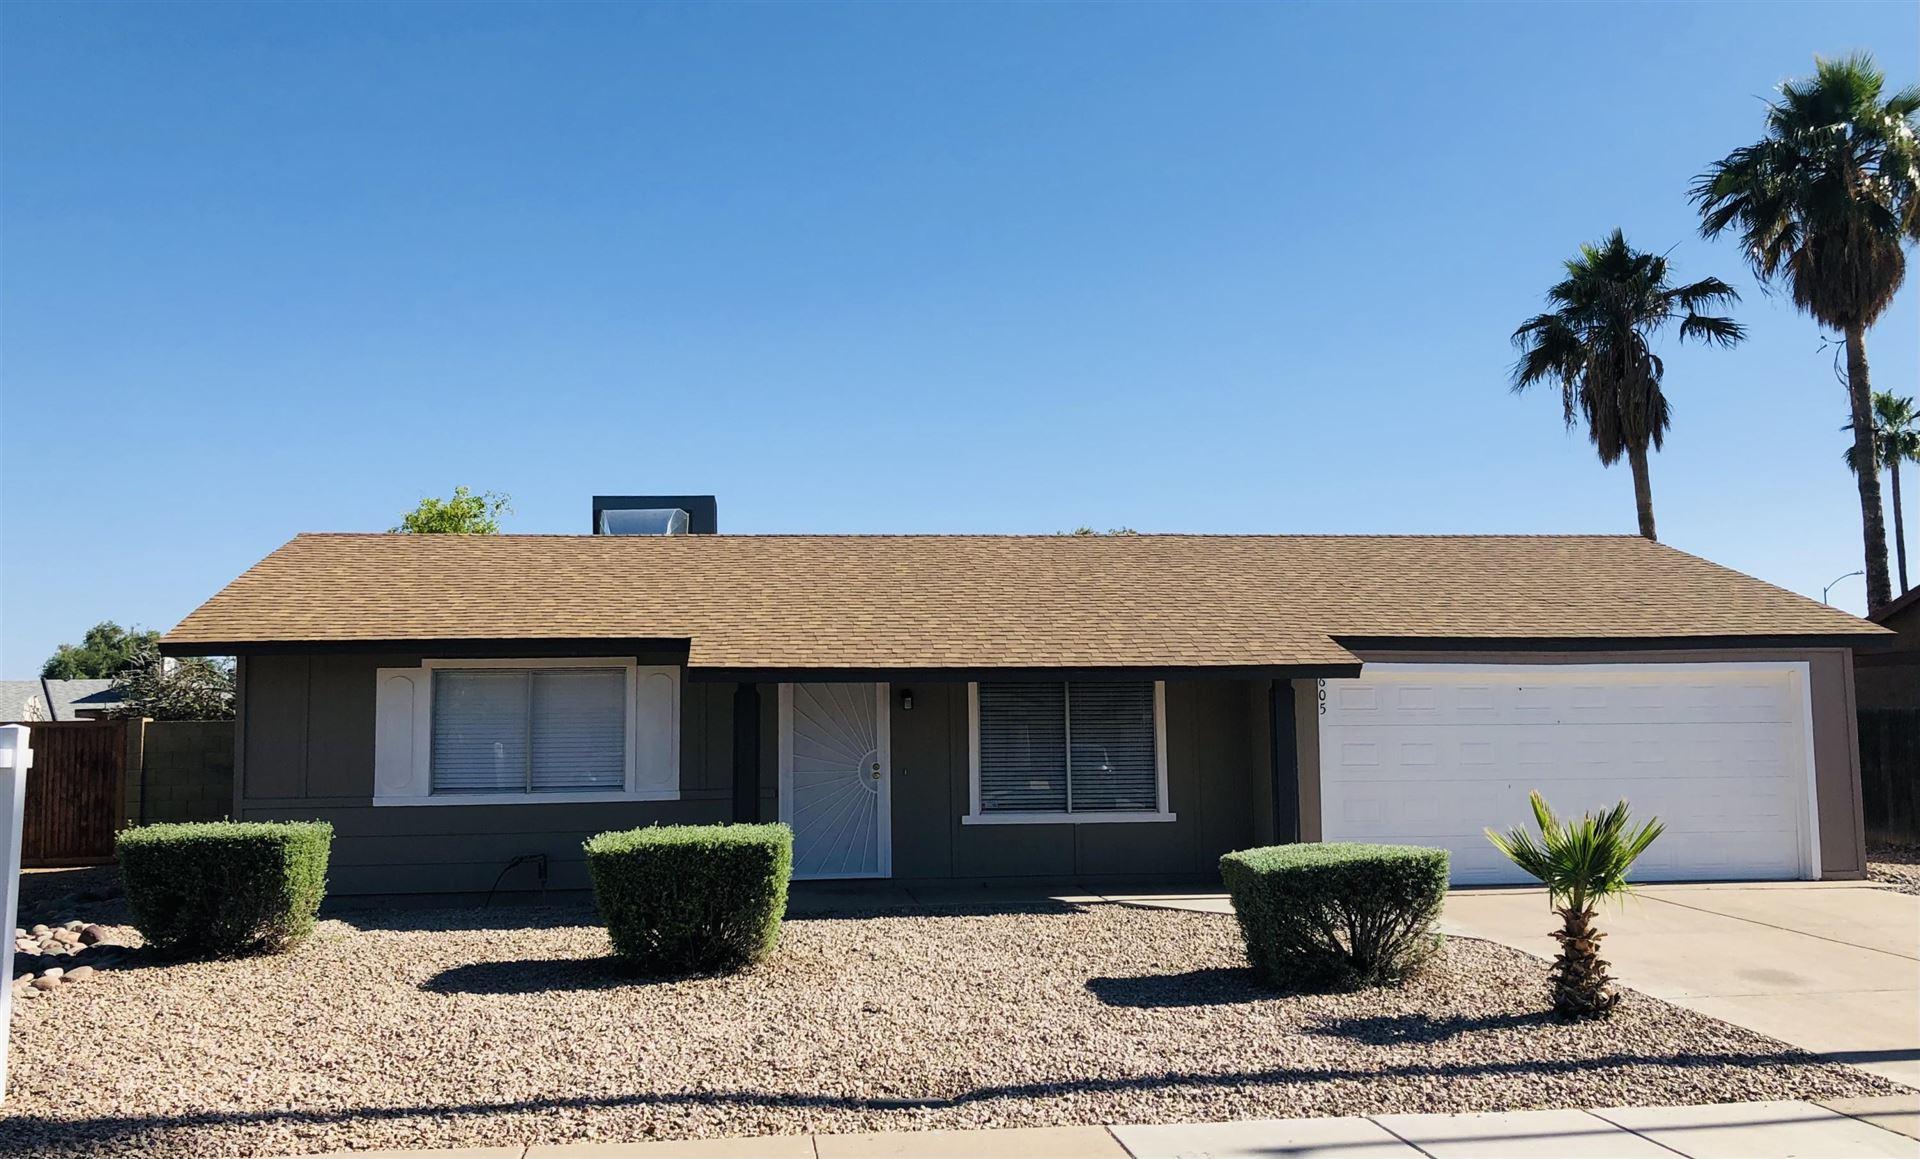 605 W FRITO Avenue, Mesa, AZ 85210 - MLS#: 6233039